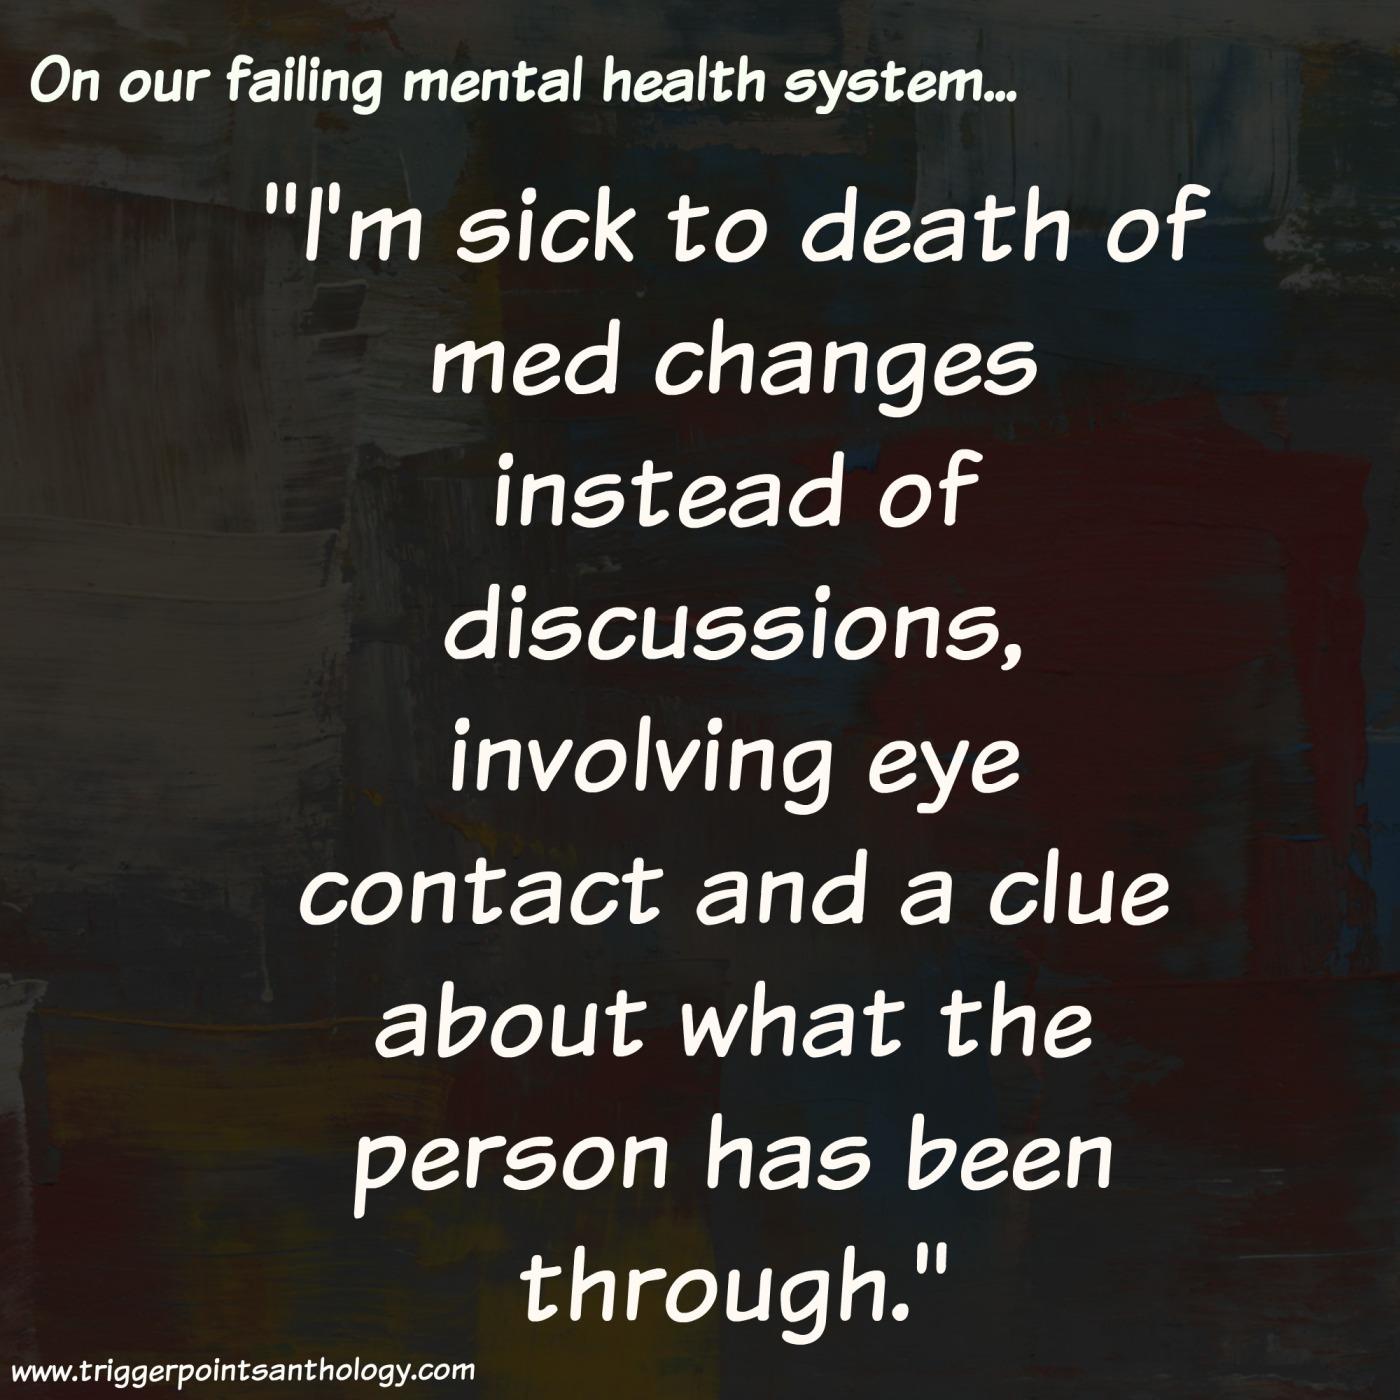 failing mh system